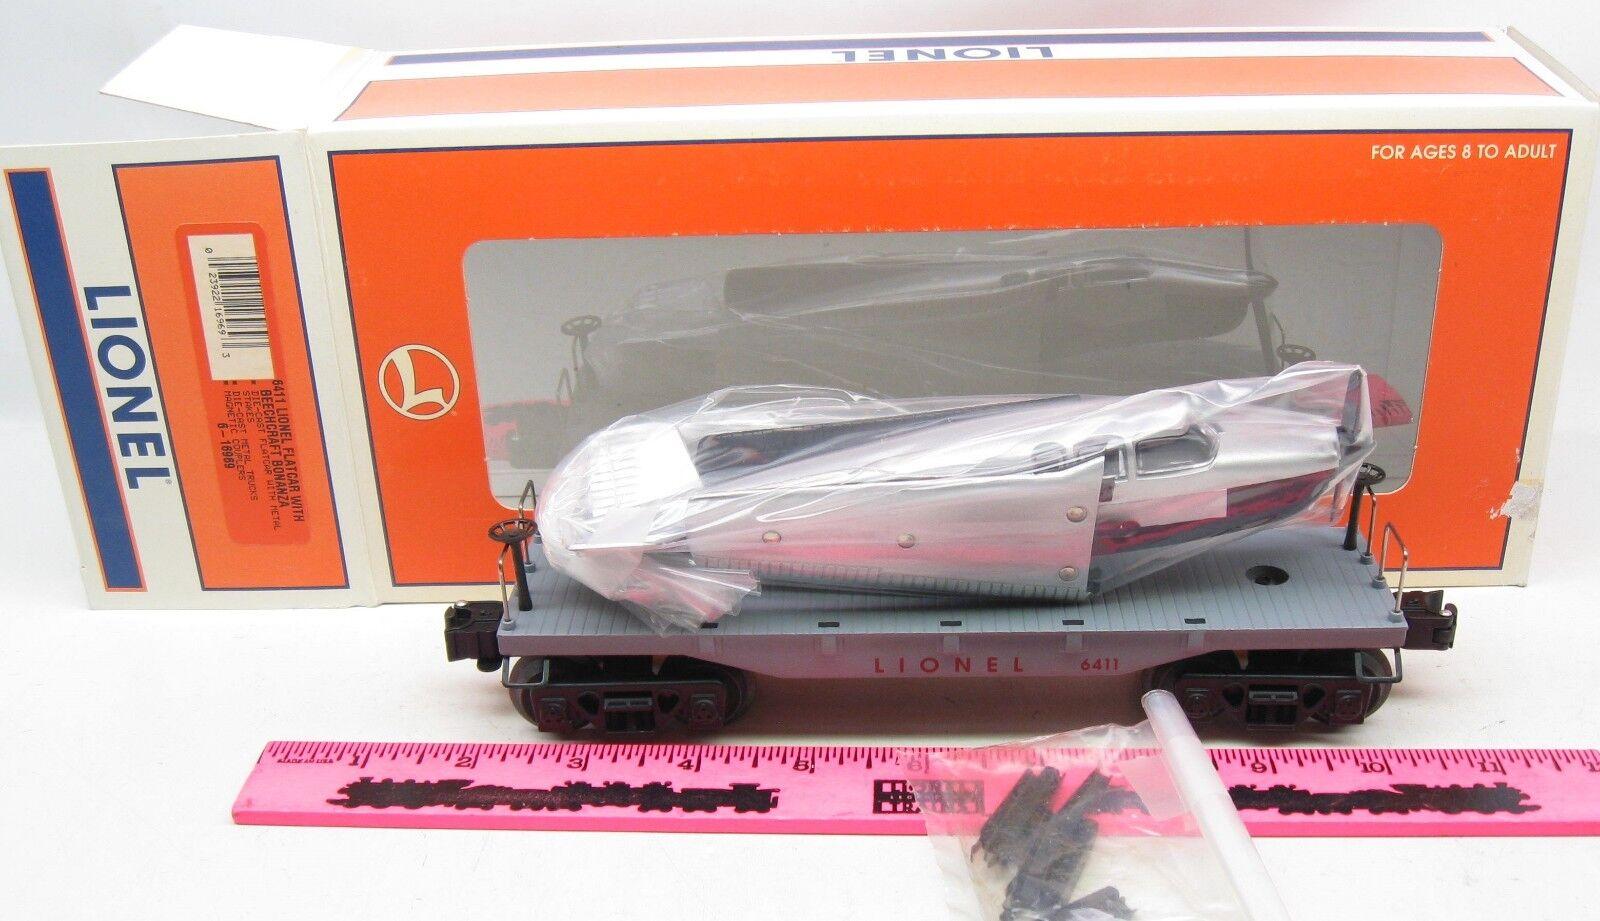 Lionel 6-16969 Lionel 6411 Flatcar with beechcraft bonanza